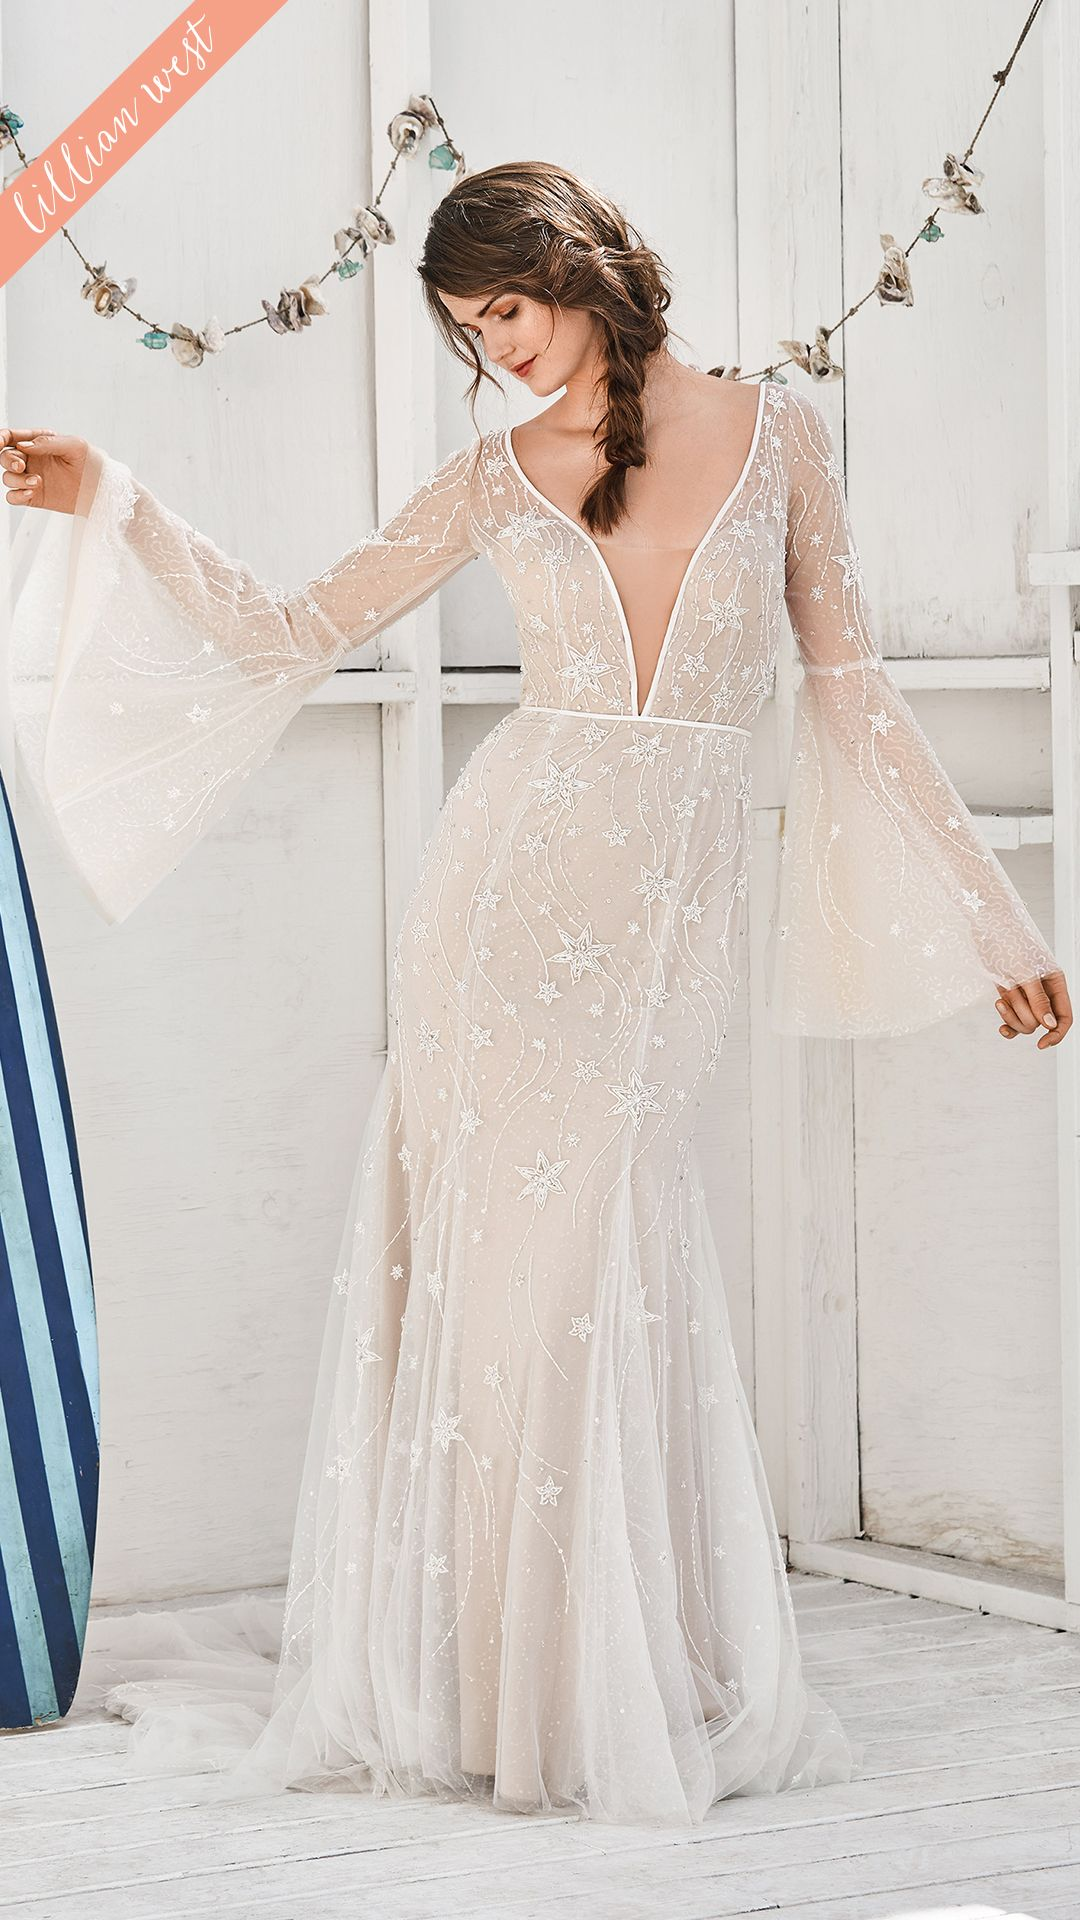 Style 66057 Shooting Star Beaded Bell Sleeve Dress Sheer Wedding Dress Lillian West Wedding Dress Dresses